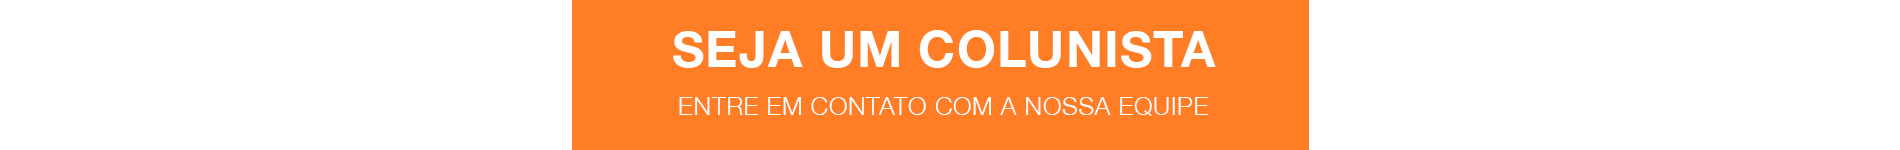 https://www.mestregp.com.br/wp-content/uploads/2018/01/botao_colunista-1900x150.png